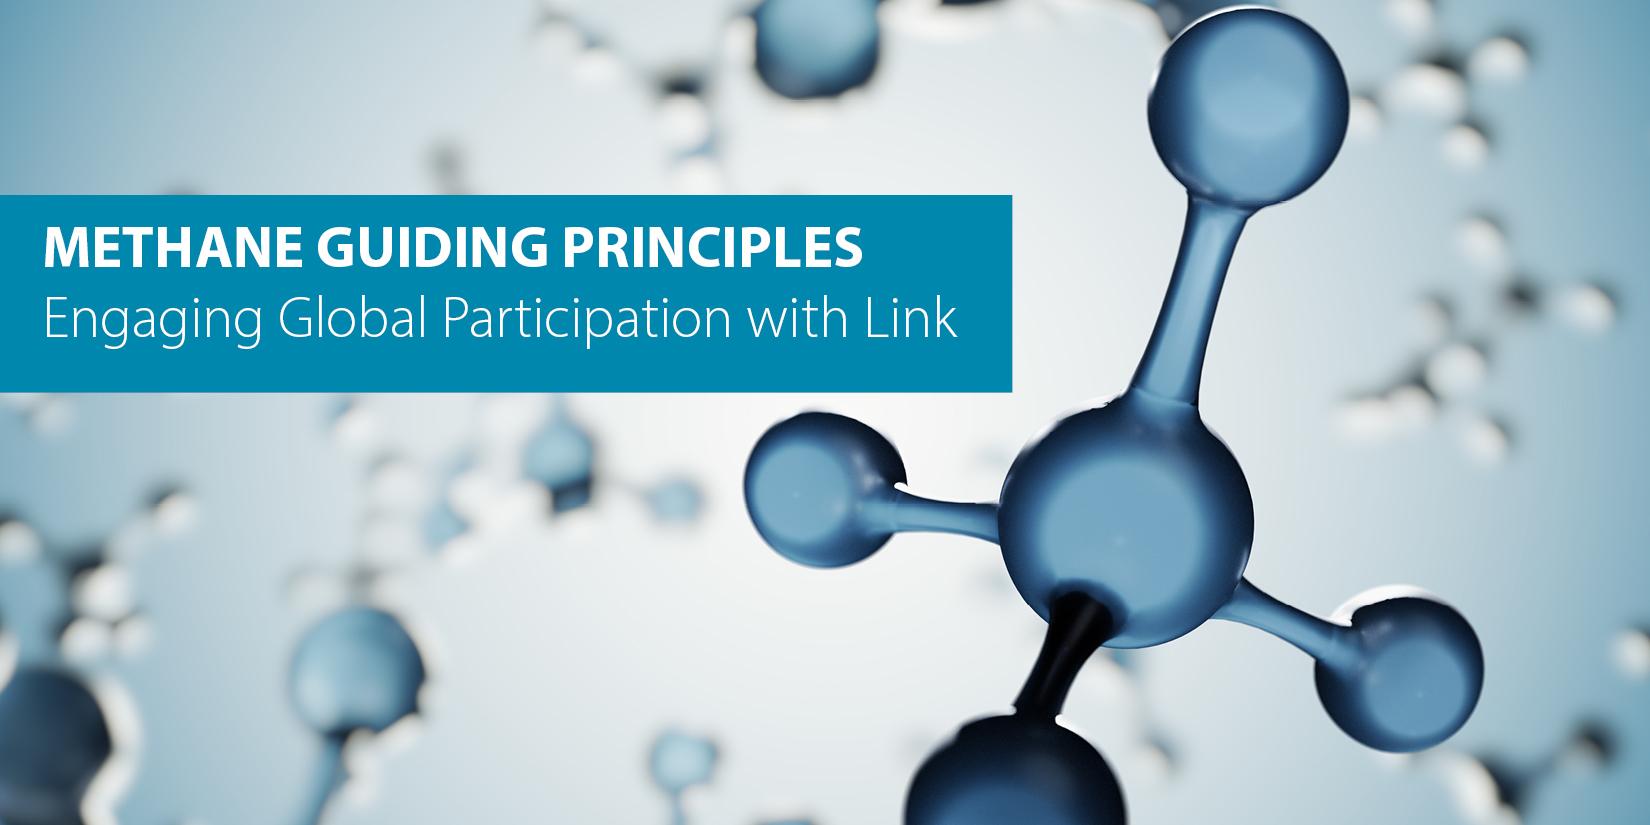 Methane Guiding Principles Engaging Global